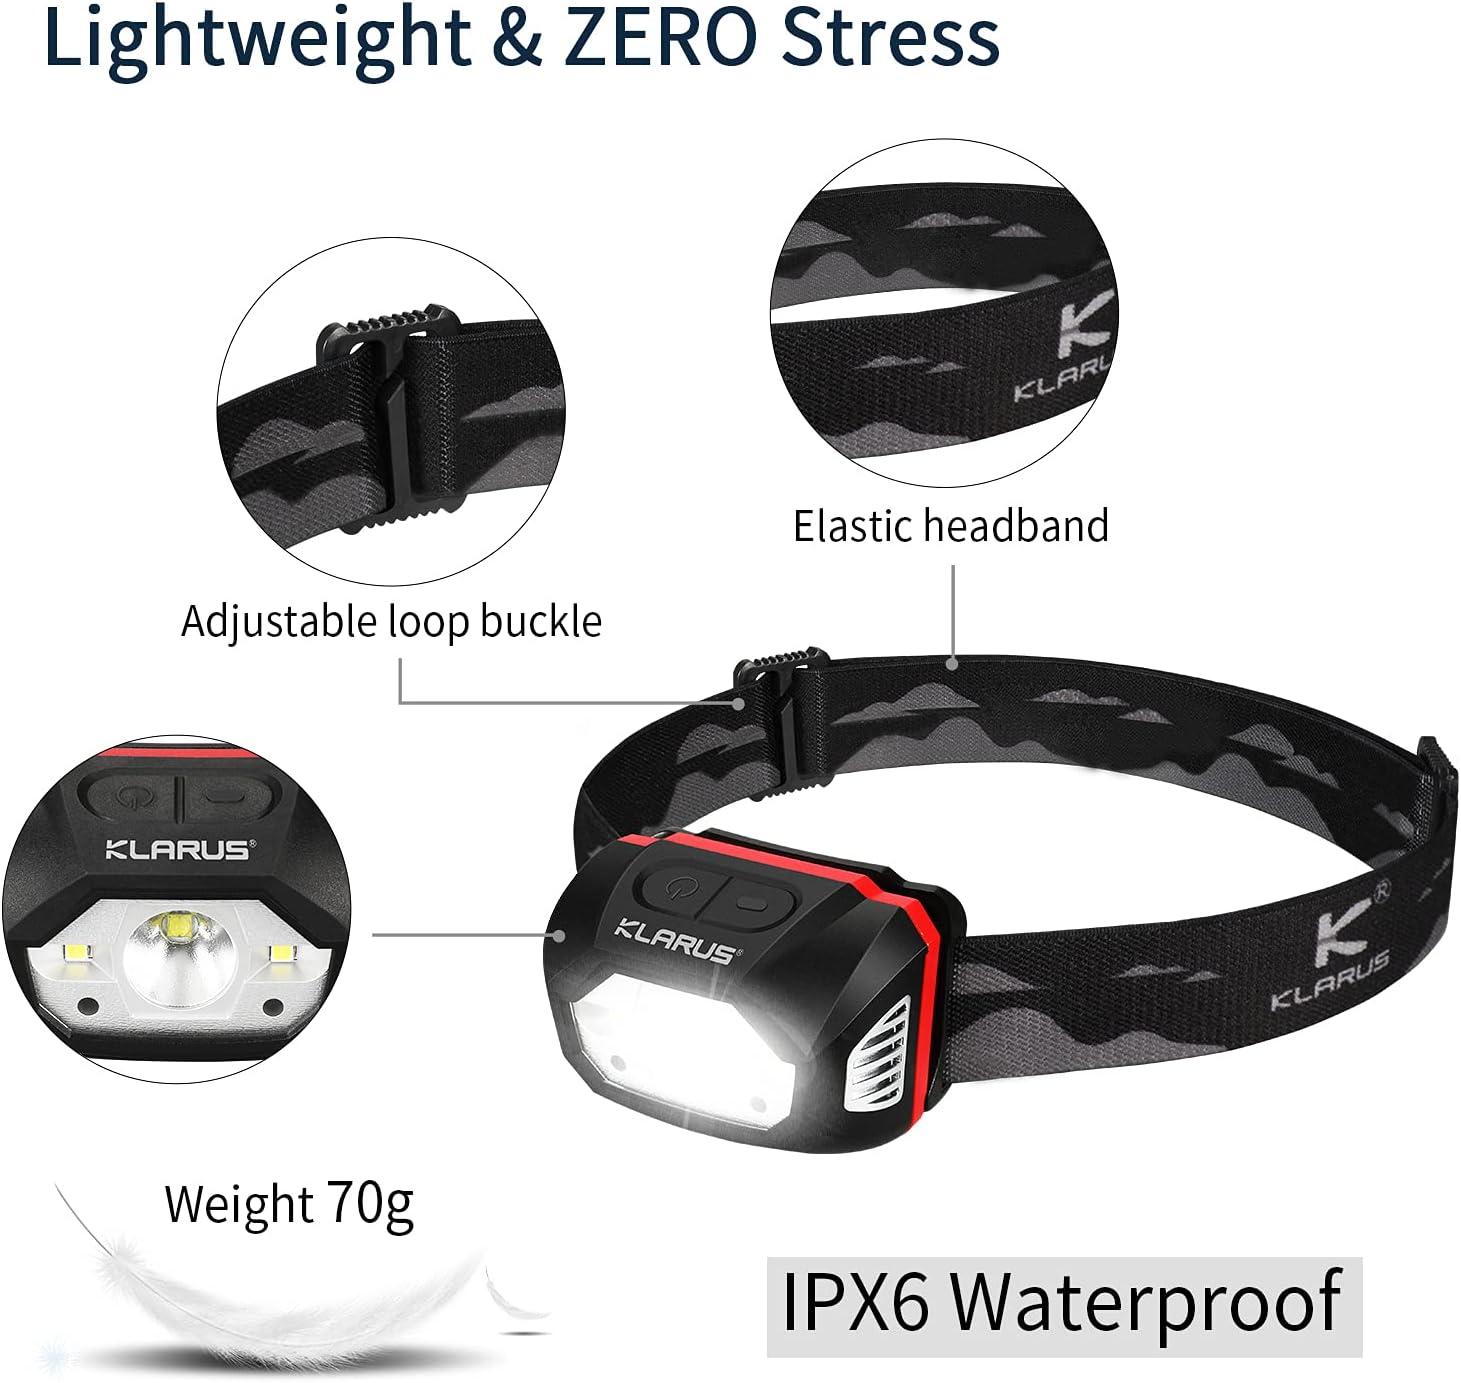 KLARUS 440 Lumen CREE LED Motion Sensor Running Rechargeable Headlamp Flashlight